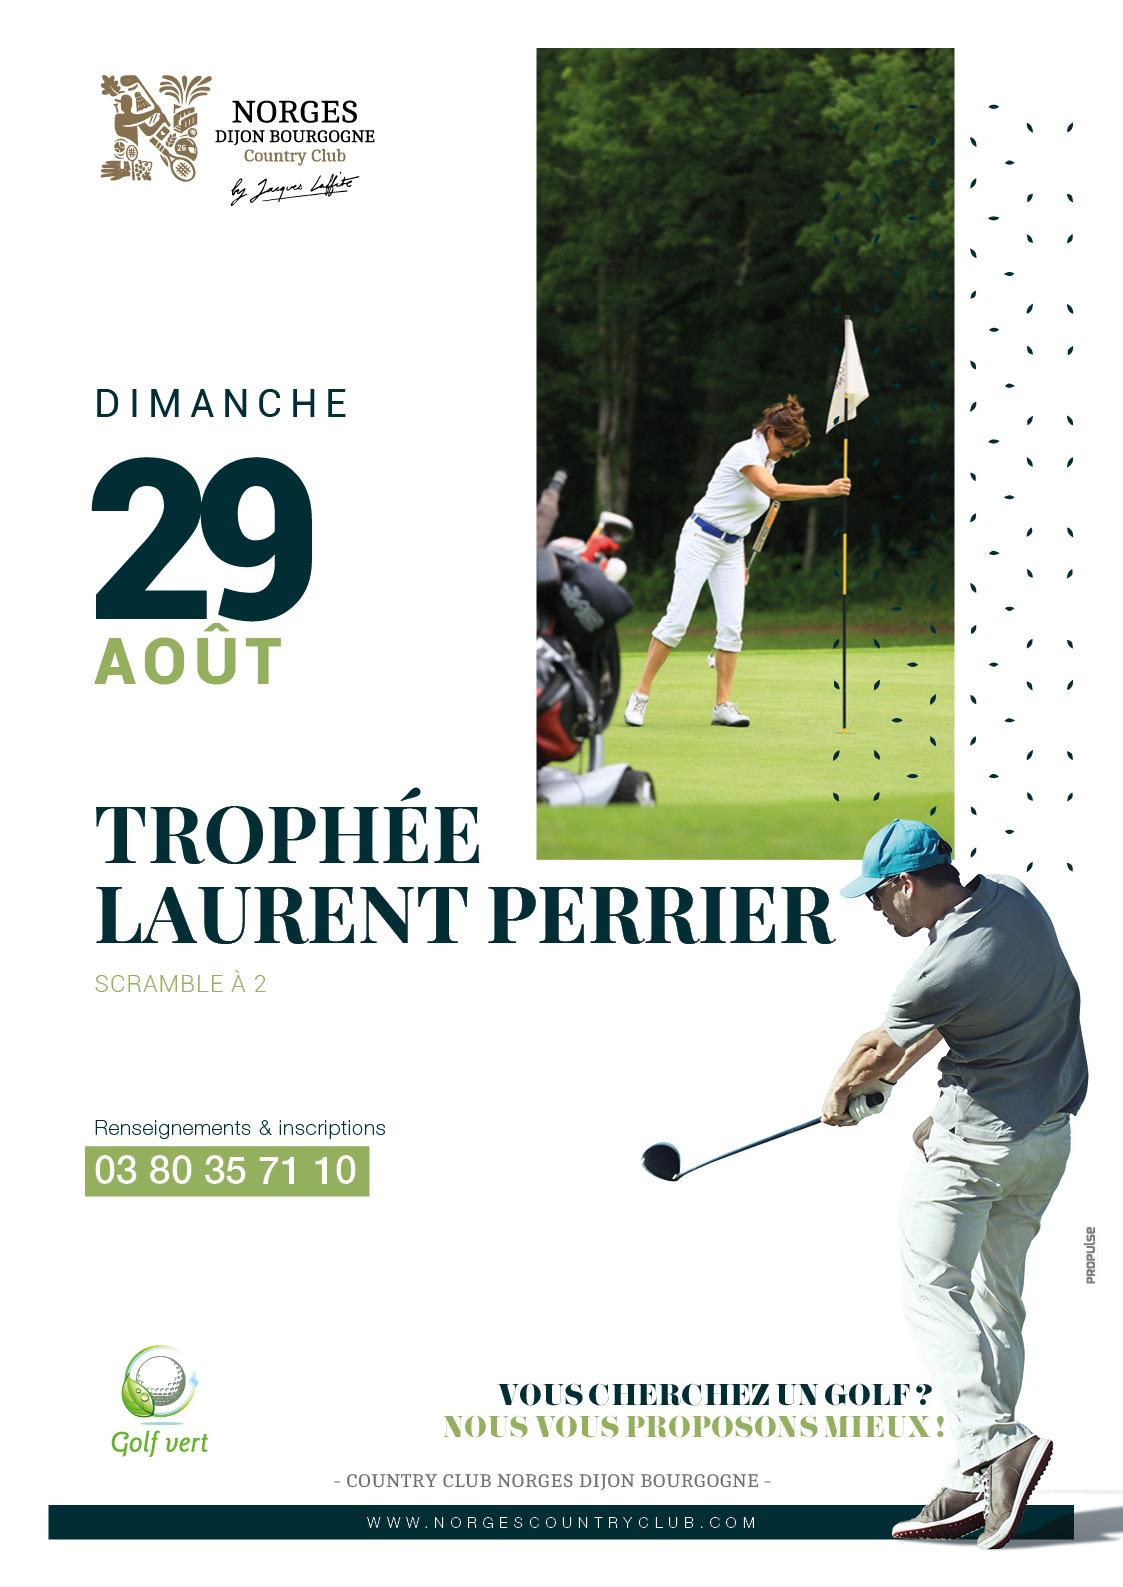 Trophée Laurent Perrier